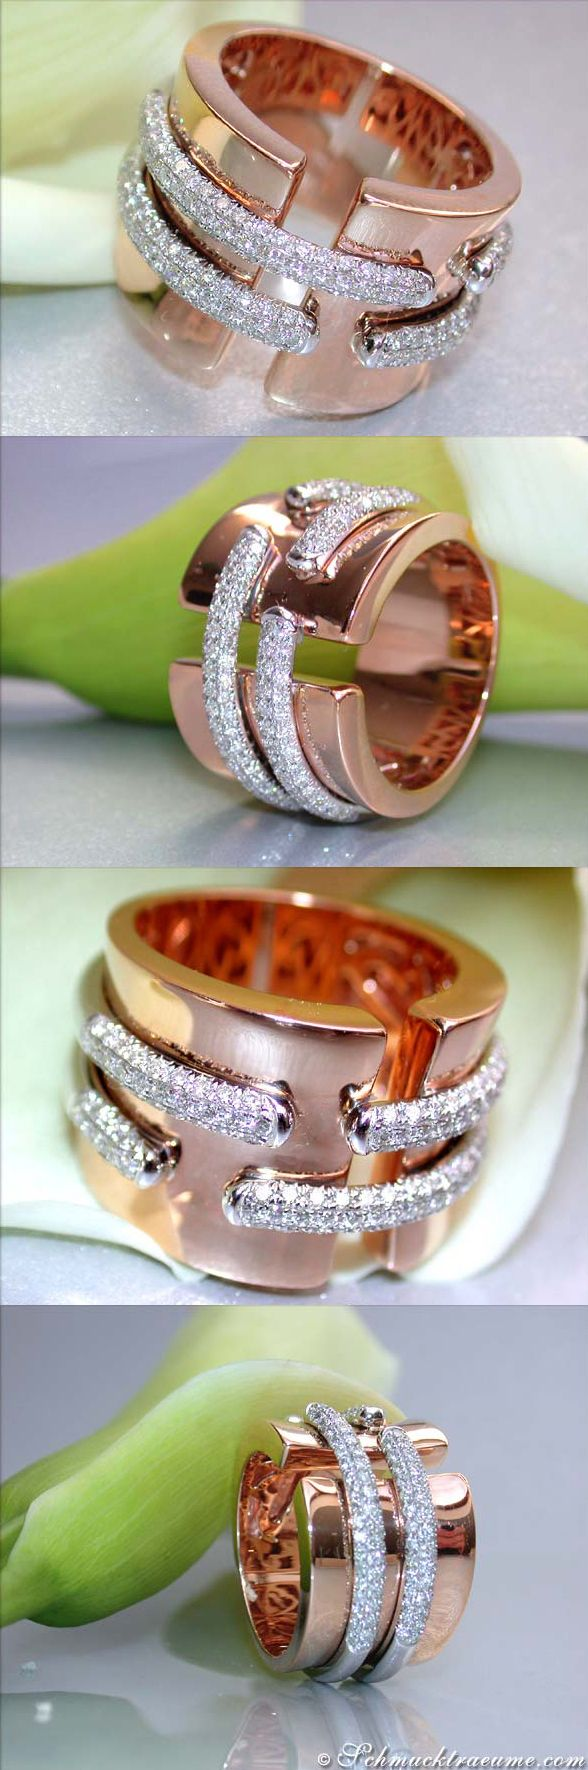 Terrific Diamond Ring, 1,05 ct.g-vsi RG18K - Visit: schmucktraeume.com - Like: https://www.facebook.com/pages/Noble-Juwelen/150871984924926 - Mail: info@schmucktraeume.com